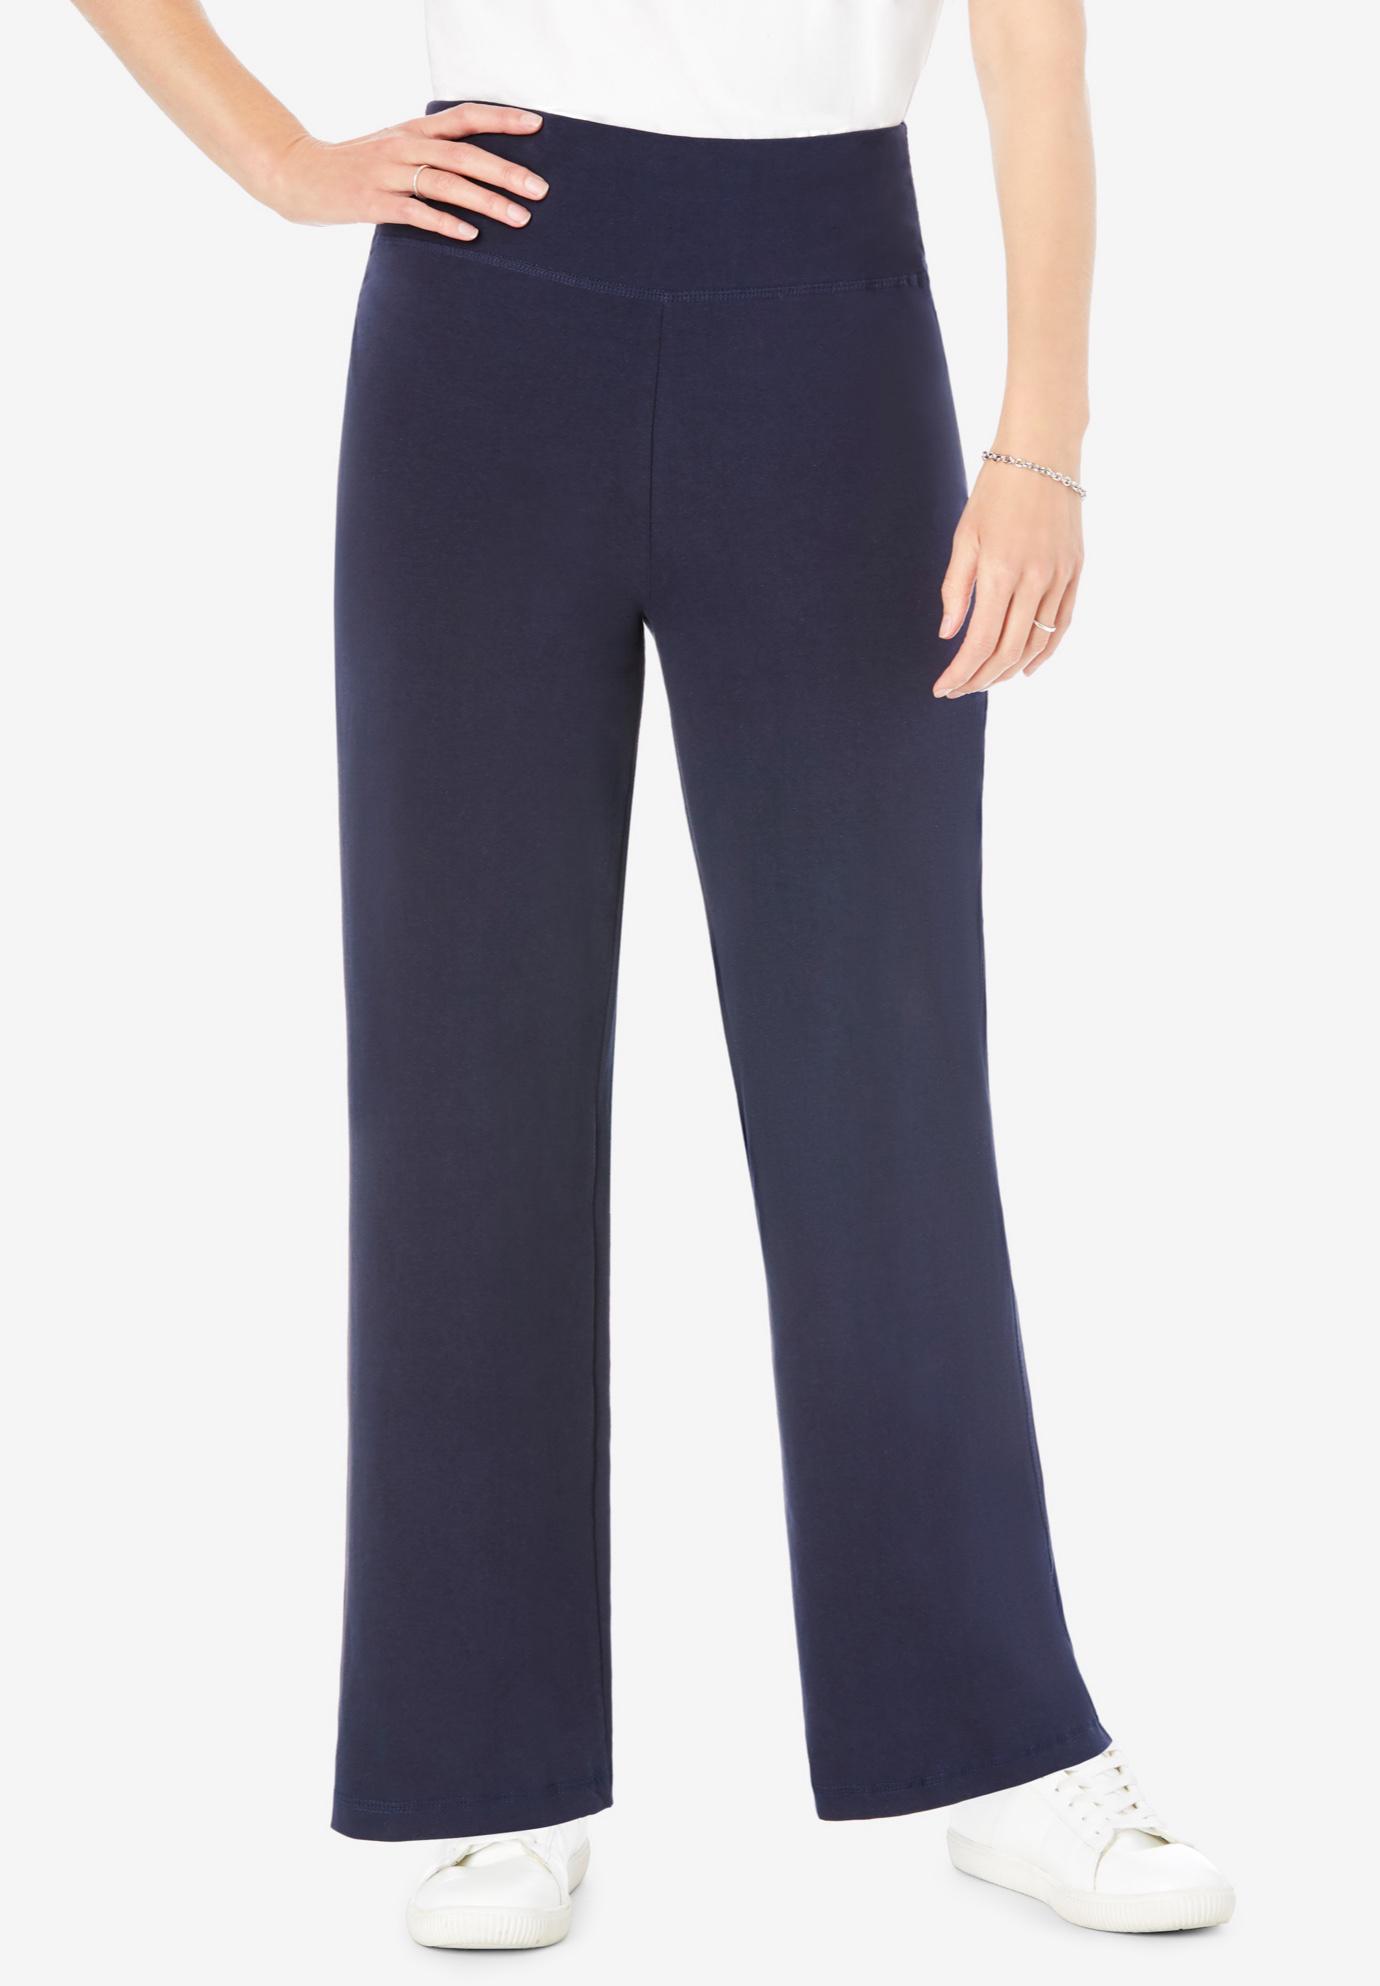 24f3e07631d5 Stretch Cotton Wide Leg Pant| Plus Size Pants | Woman Within